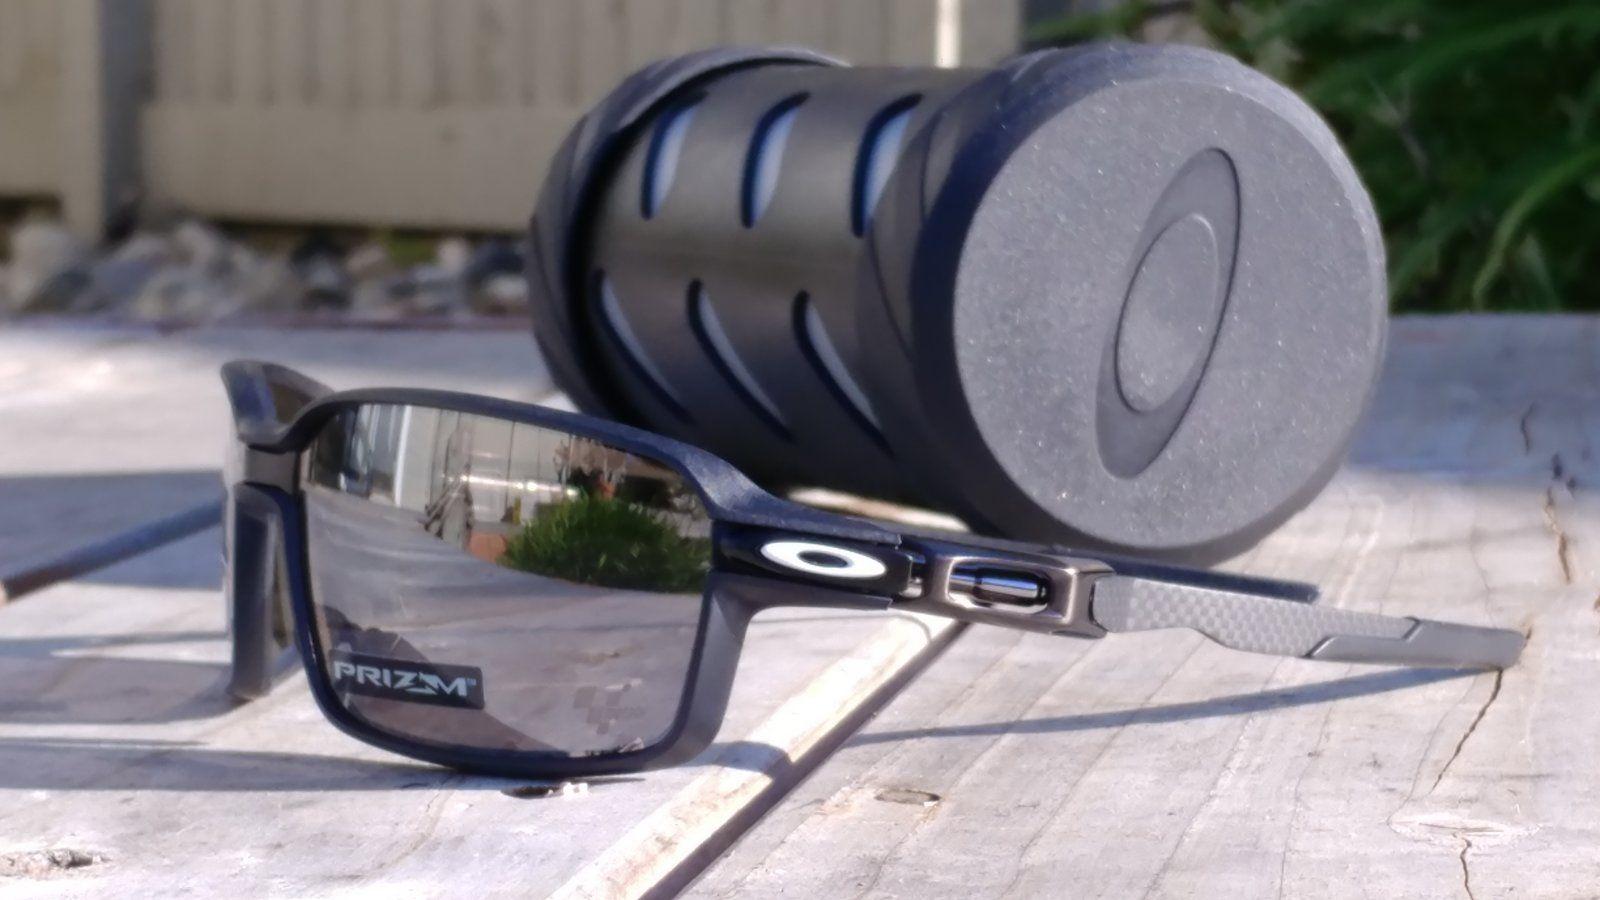 Review: Oakley Carbon Prime Limited Edition MotoGP — SKU OO6021-0463~(I619XX -I62XXX) - 20170612_181653.jpg